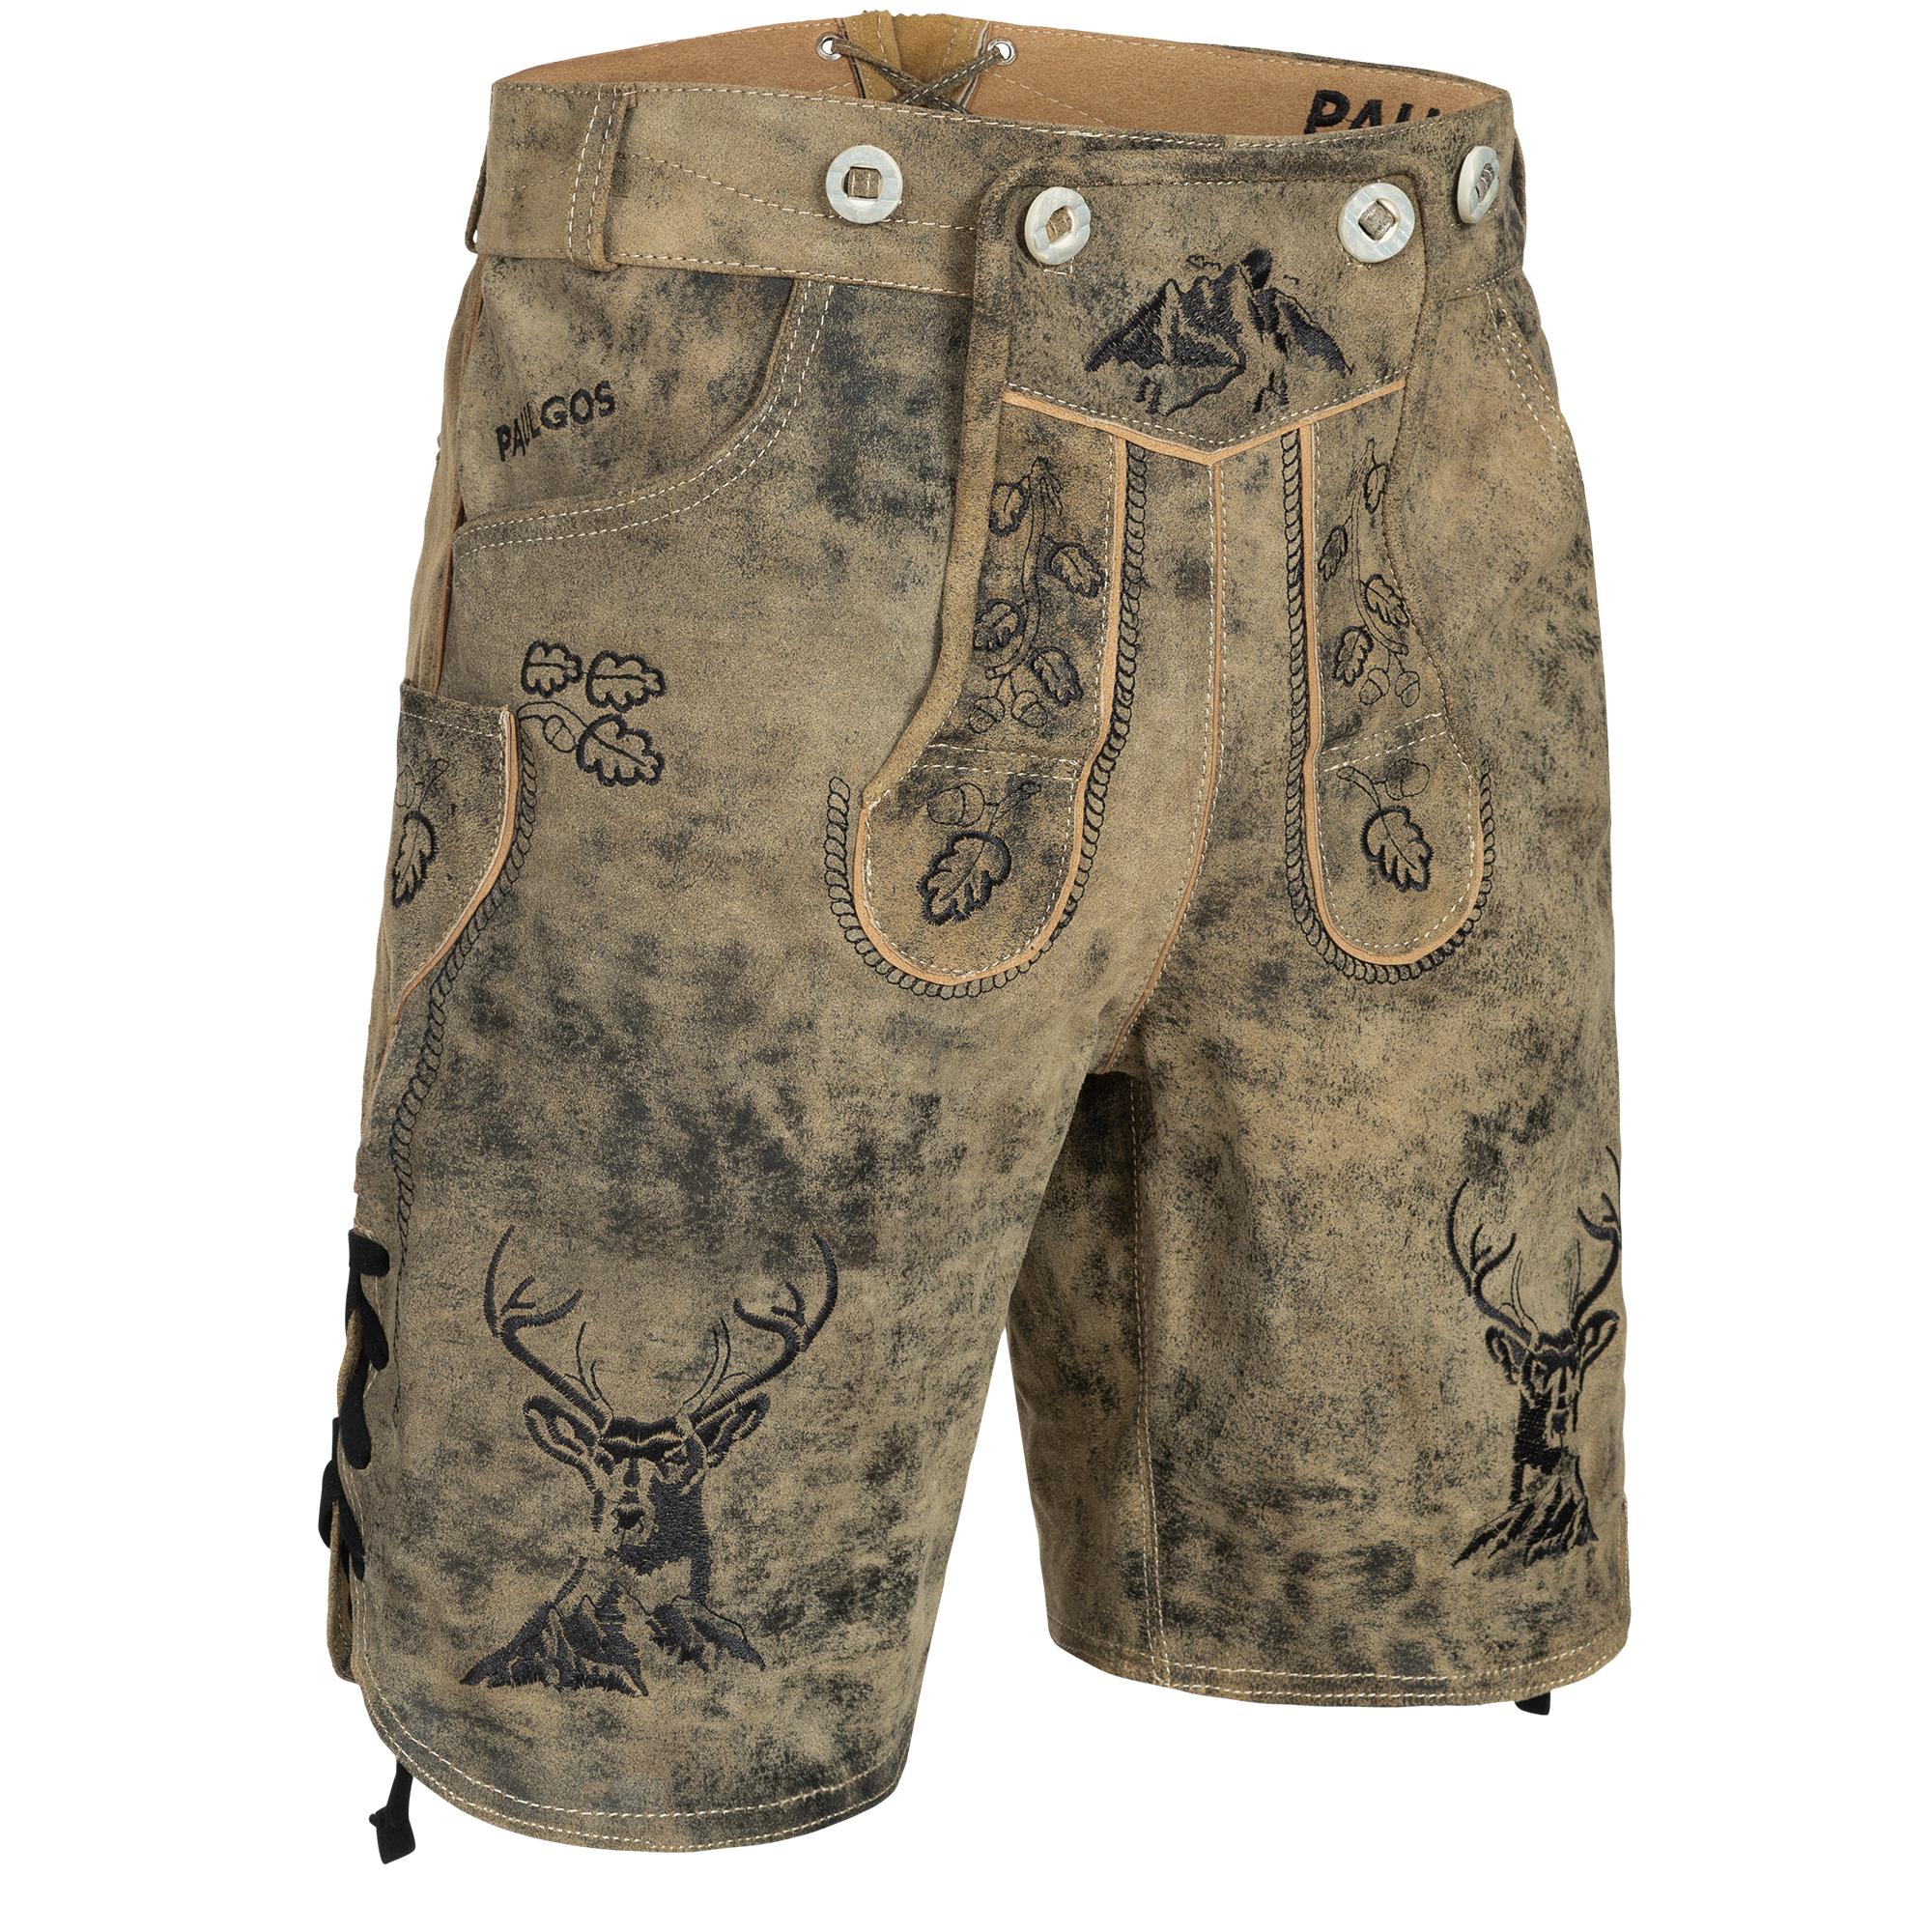 Details zu PAULGOS Herren Trachten Lederhose + Träger Echtes Leder, Kurz 3 Farben HK4 Antik